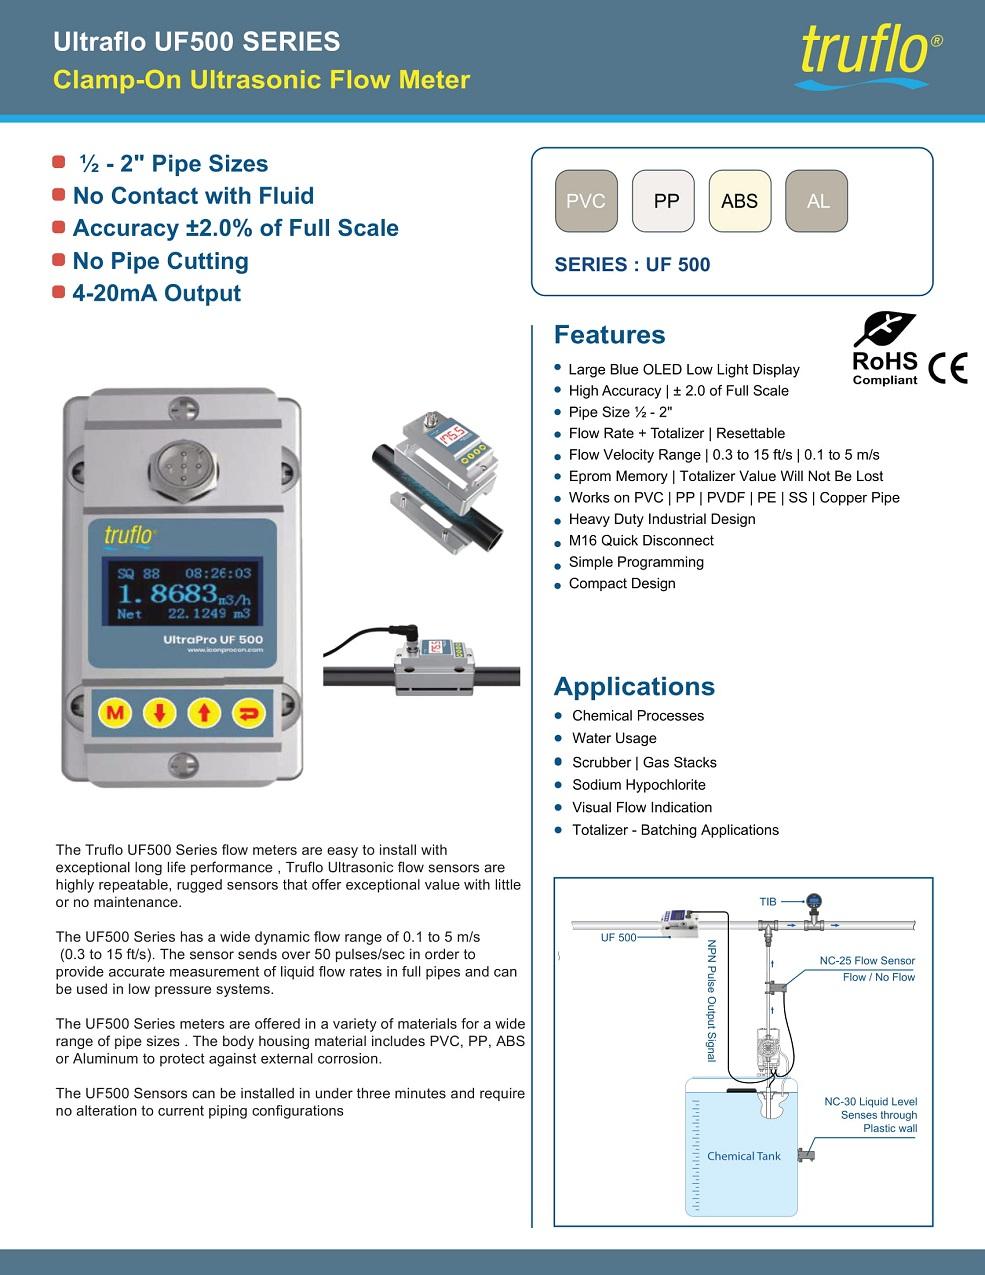 Ultraflo UF500 Clamp-On Ultrasonic Flow Meter